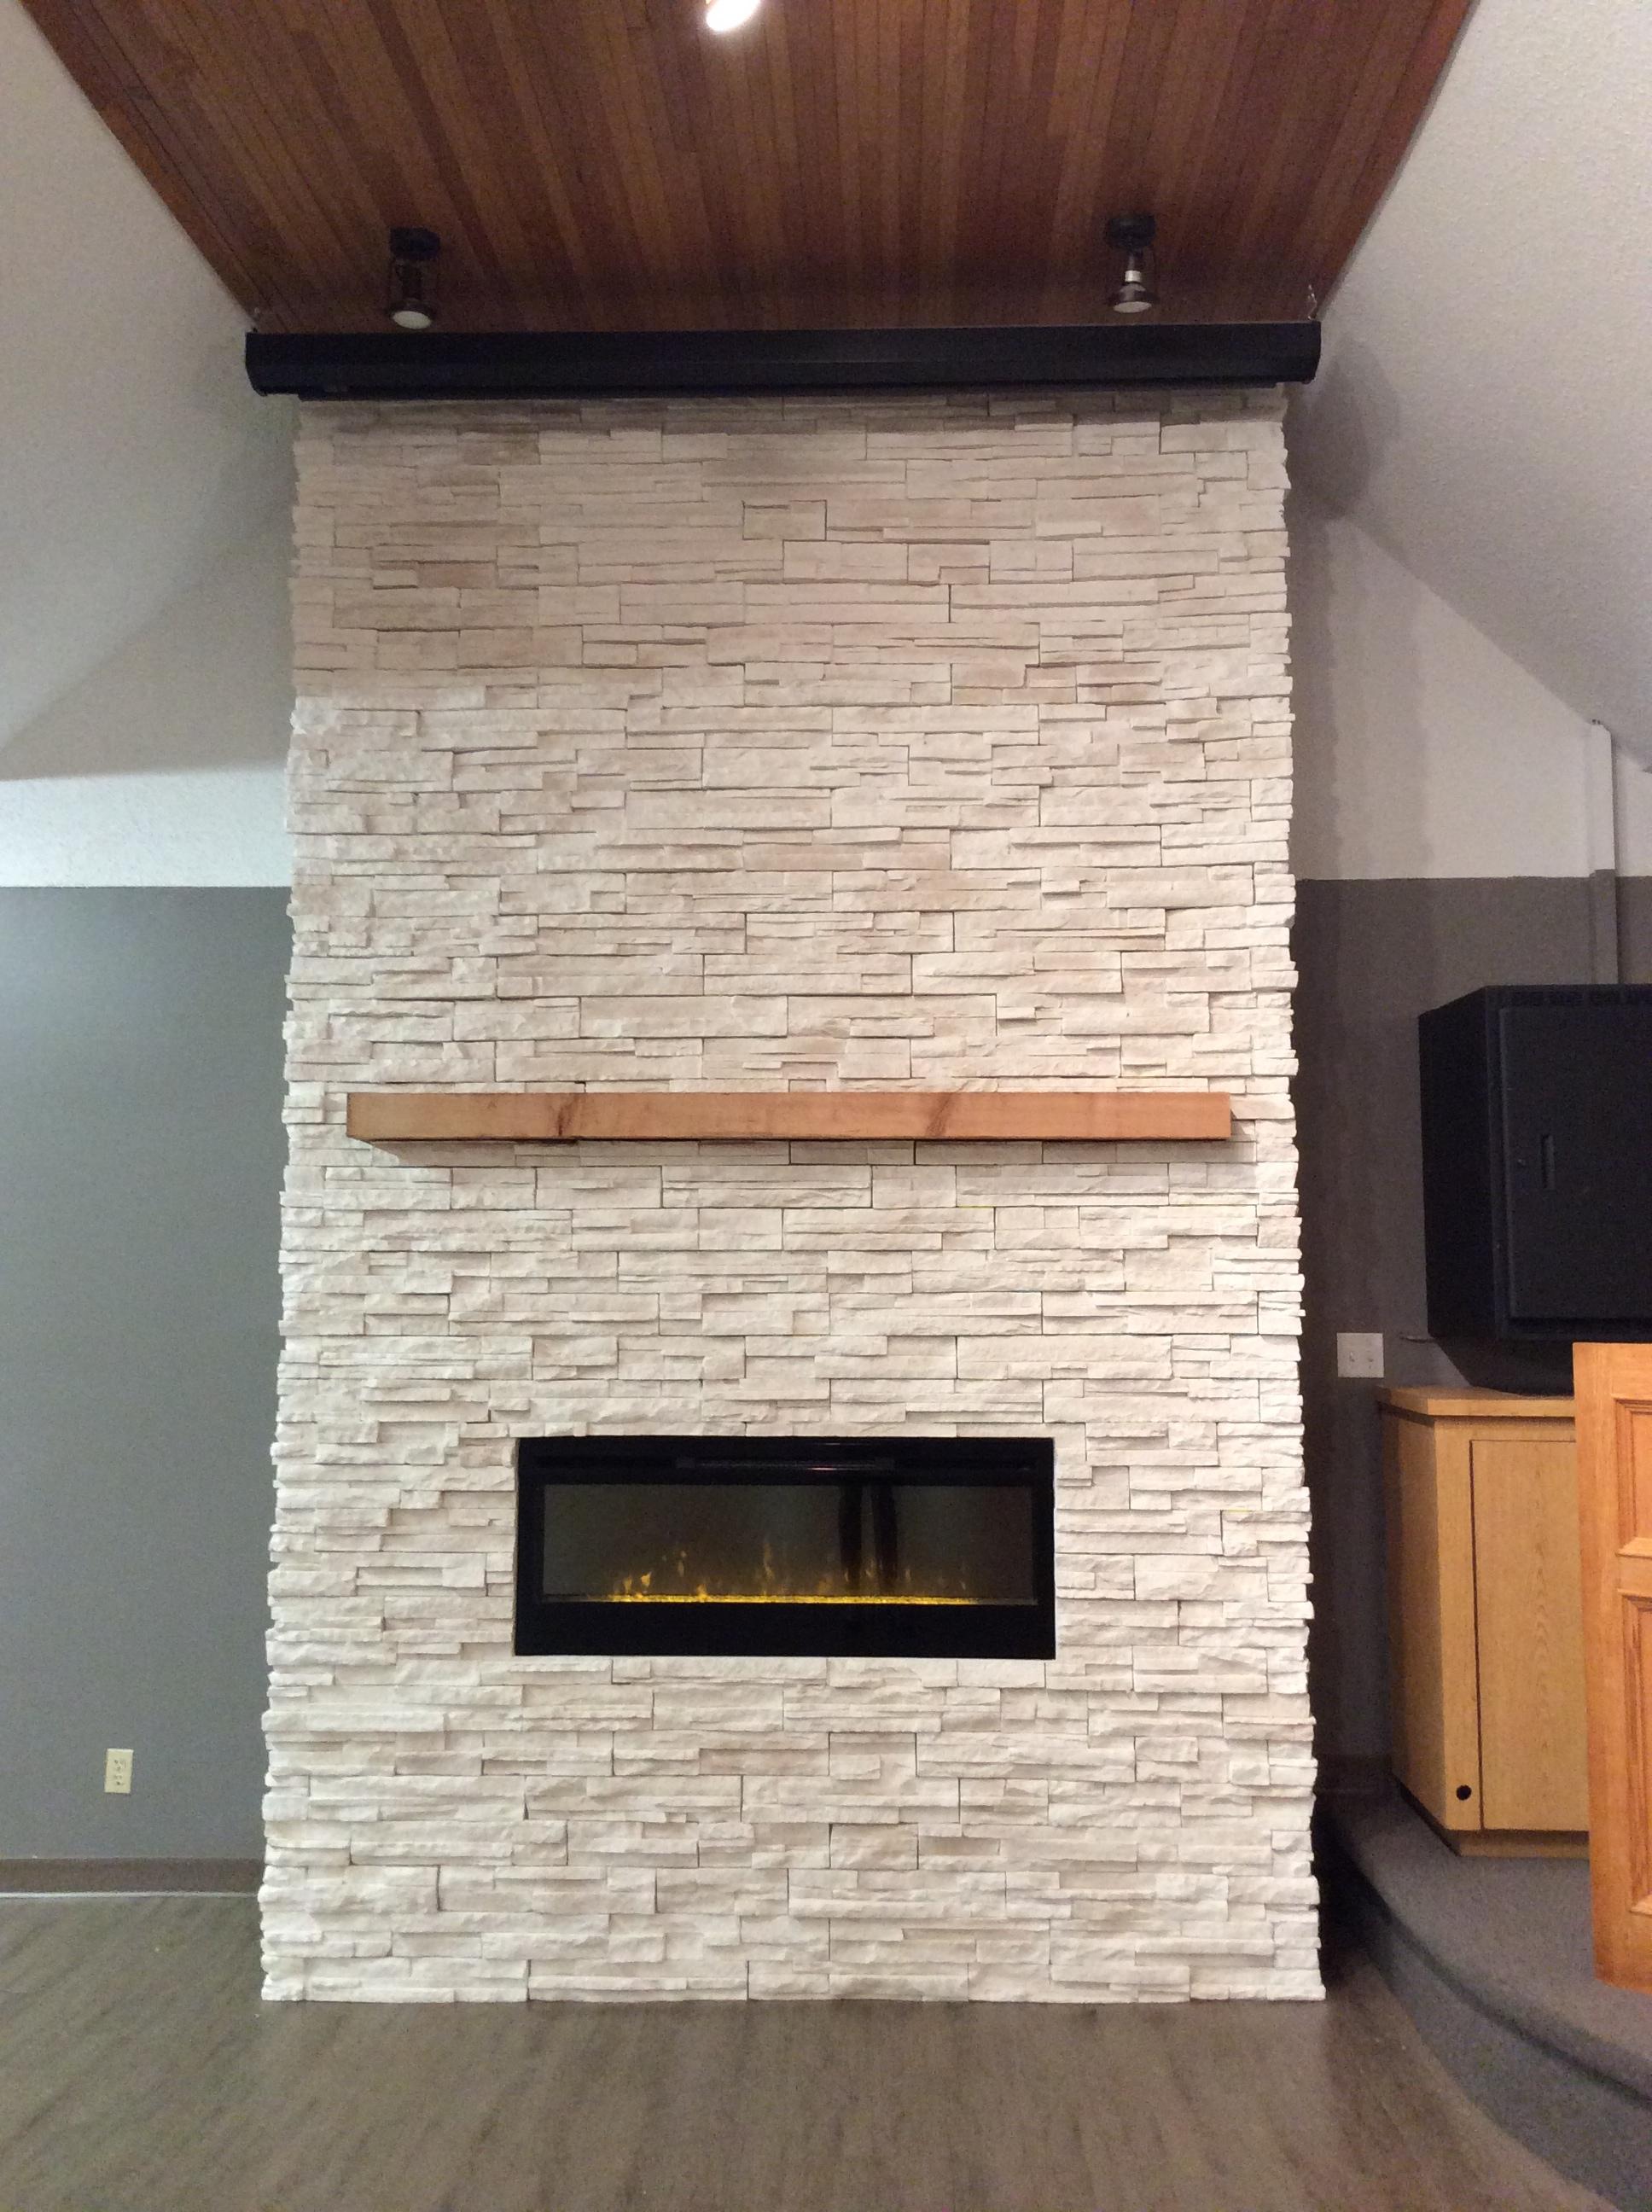 Wood look vinyl flooring, Split faced stone fireplace, rustic mantel.